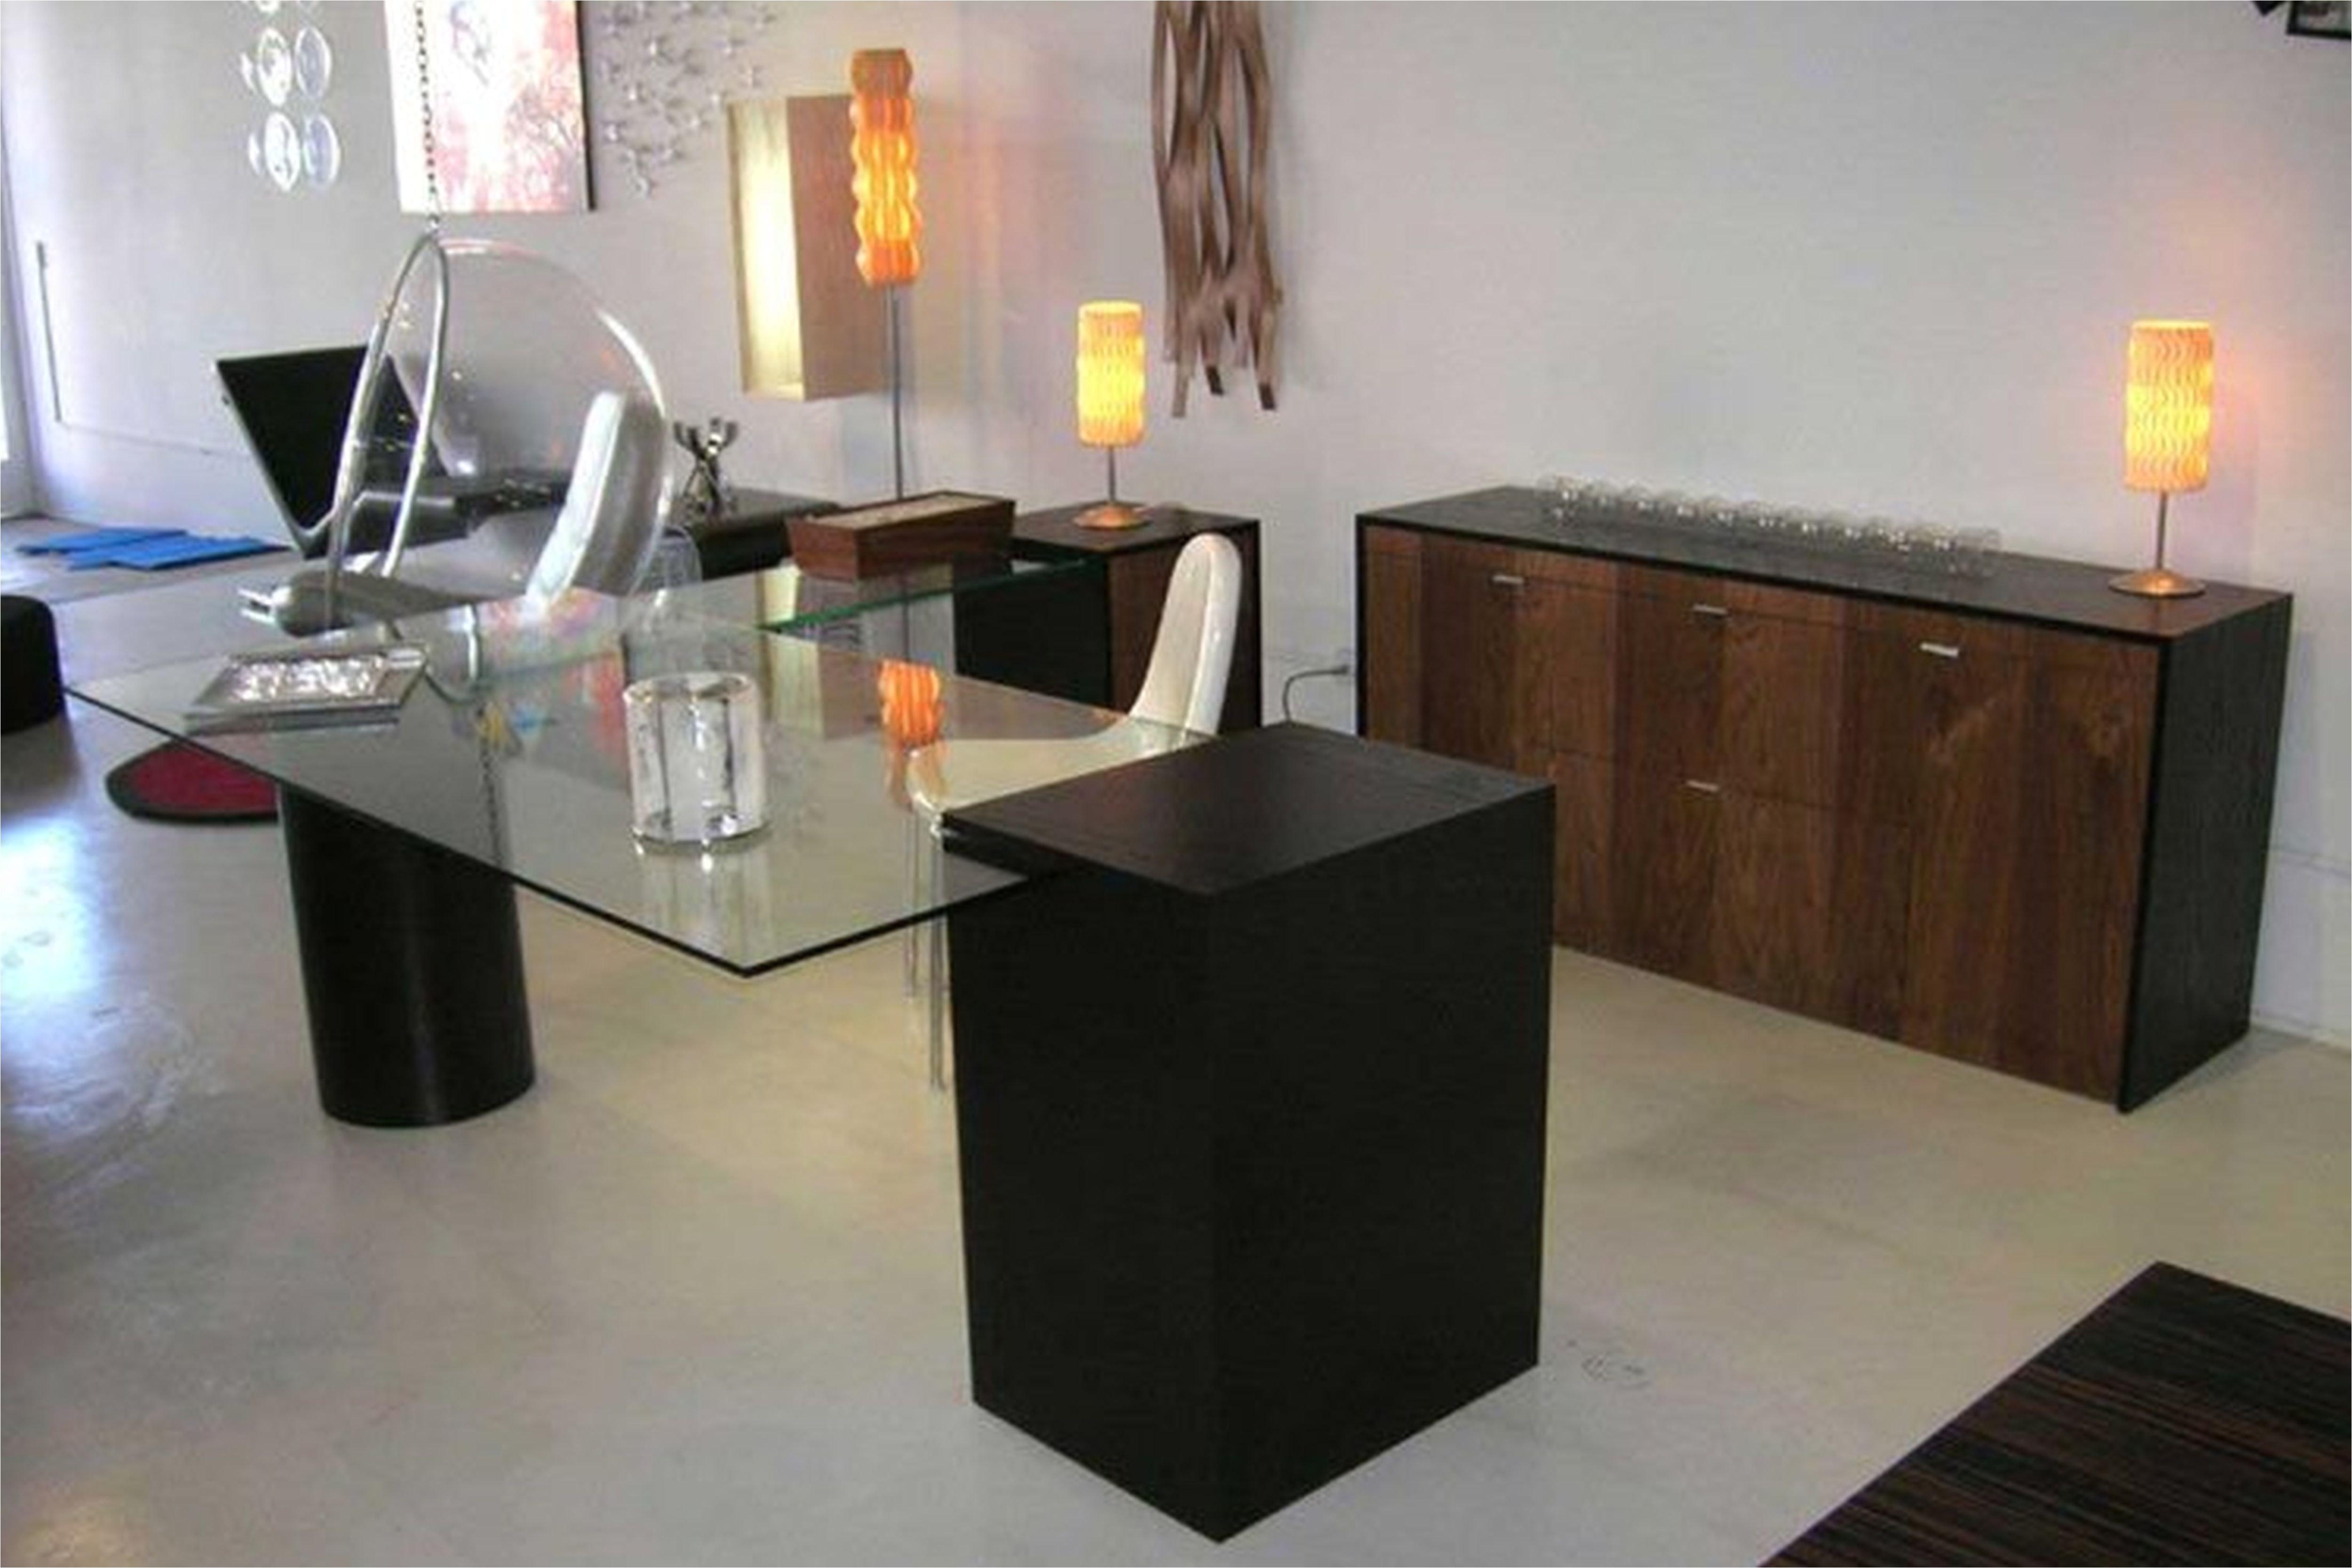 used office furniture greensboro nc popular modern fice design ideas for small spaces interior design